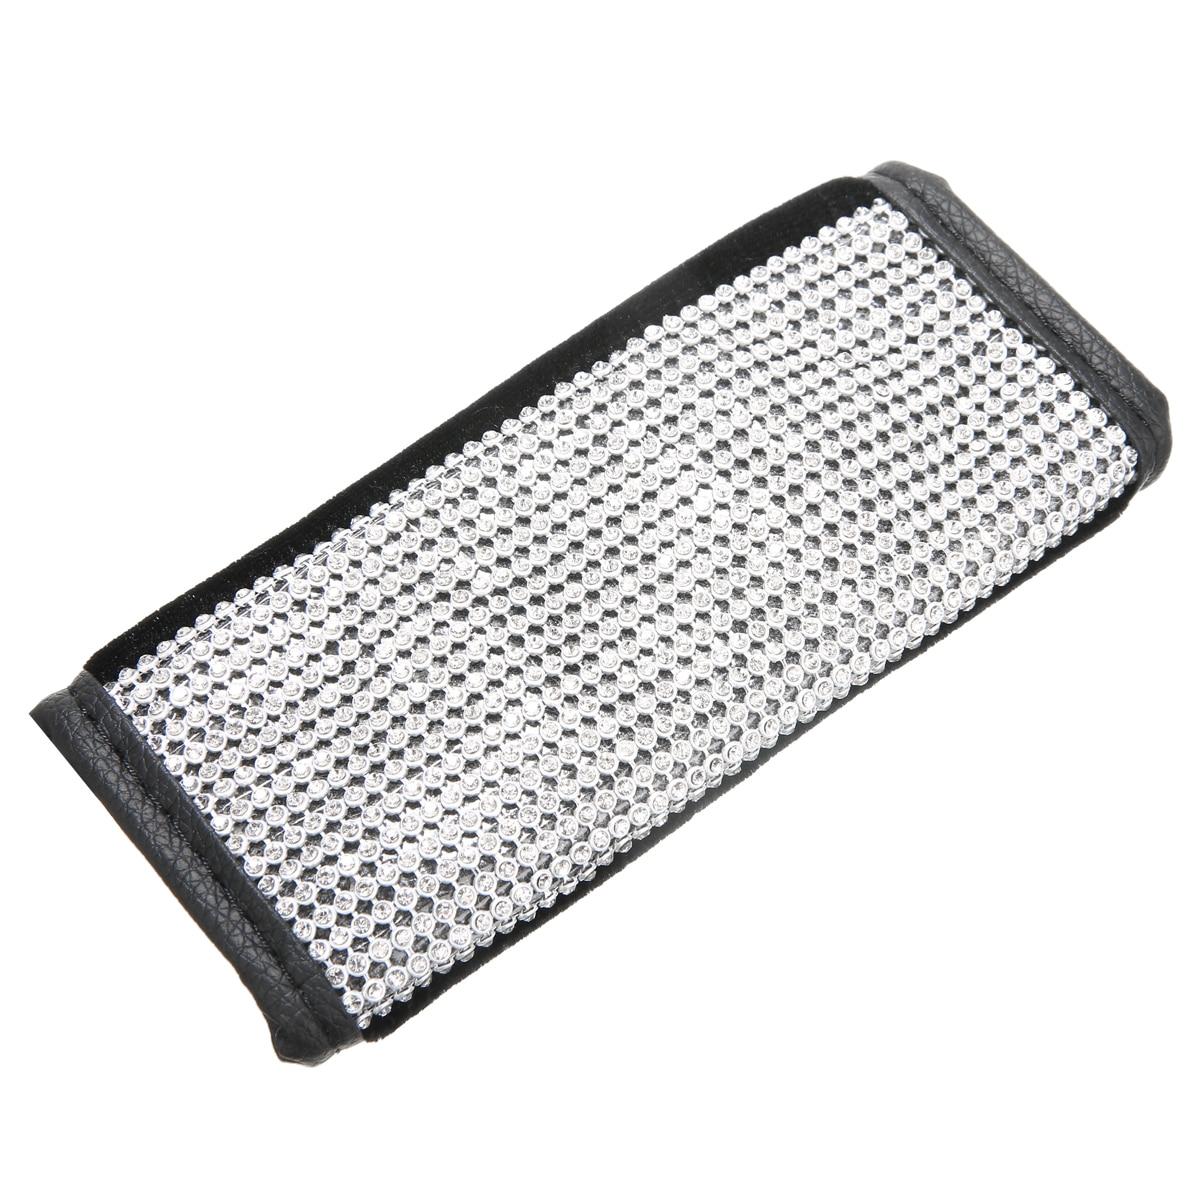 1PC Durable PU Leather Car Bling Handbrake Hand Brake Decor Cover Black Rhinestone Crystal Interior Trim Parts Accessories